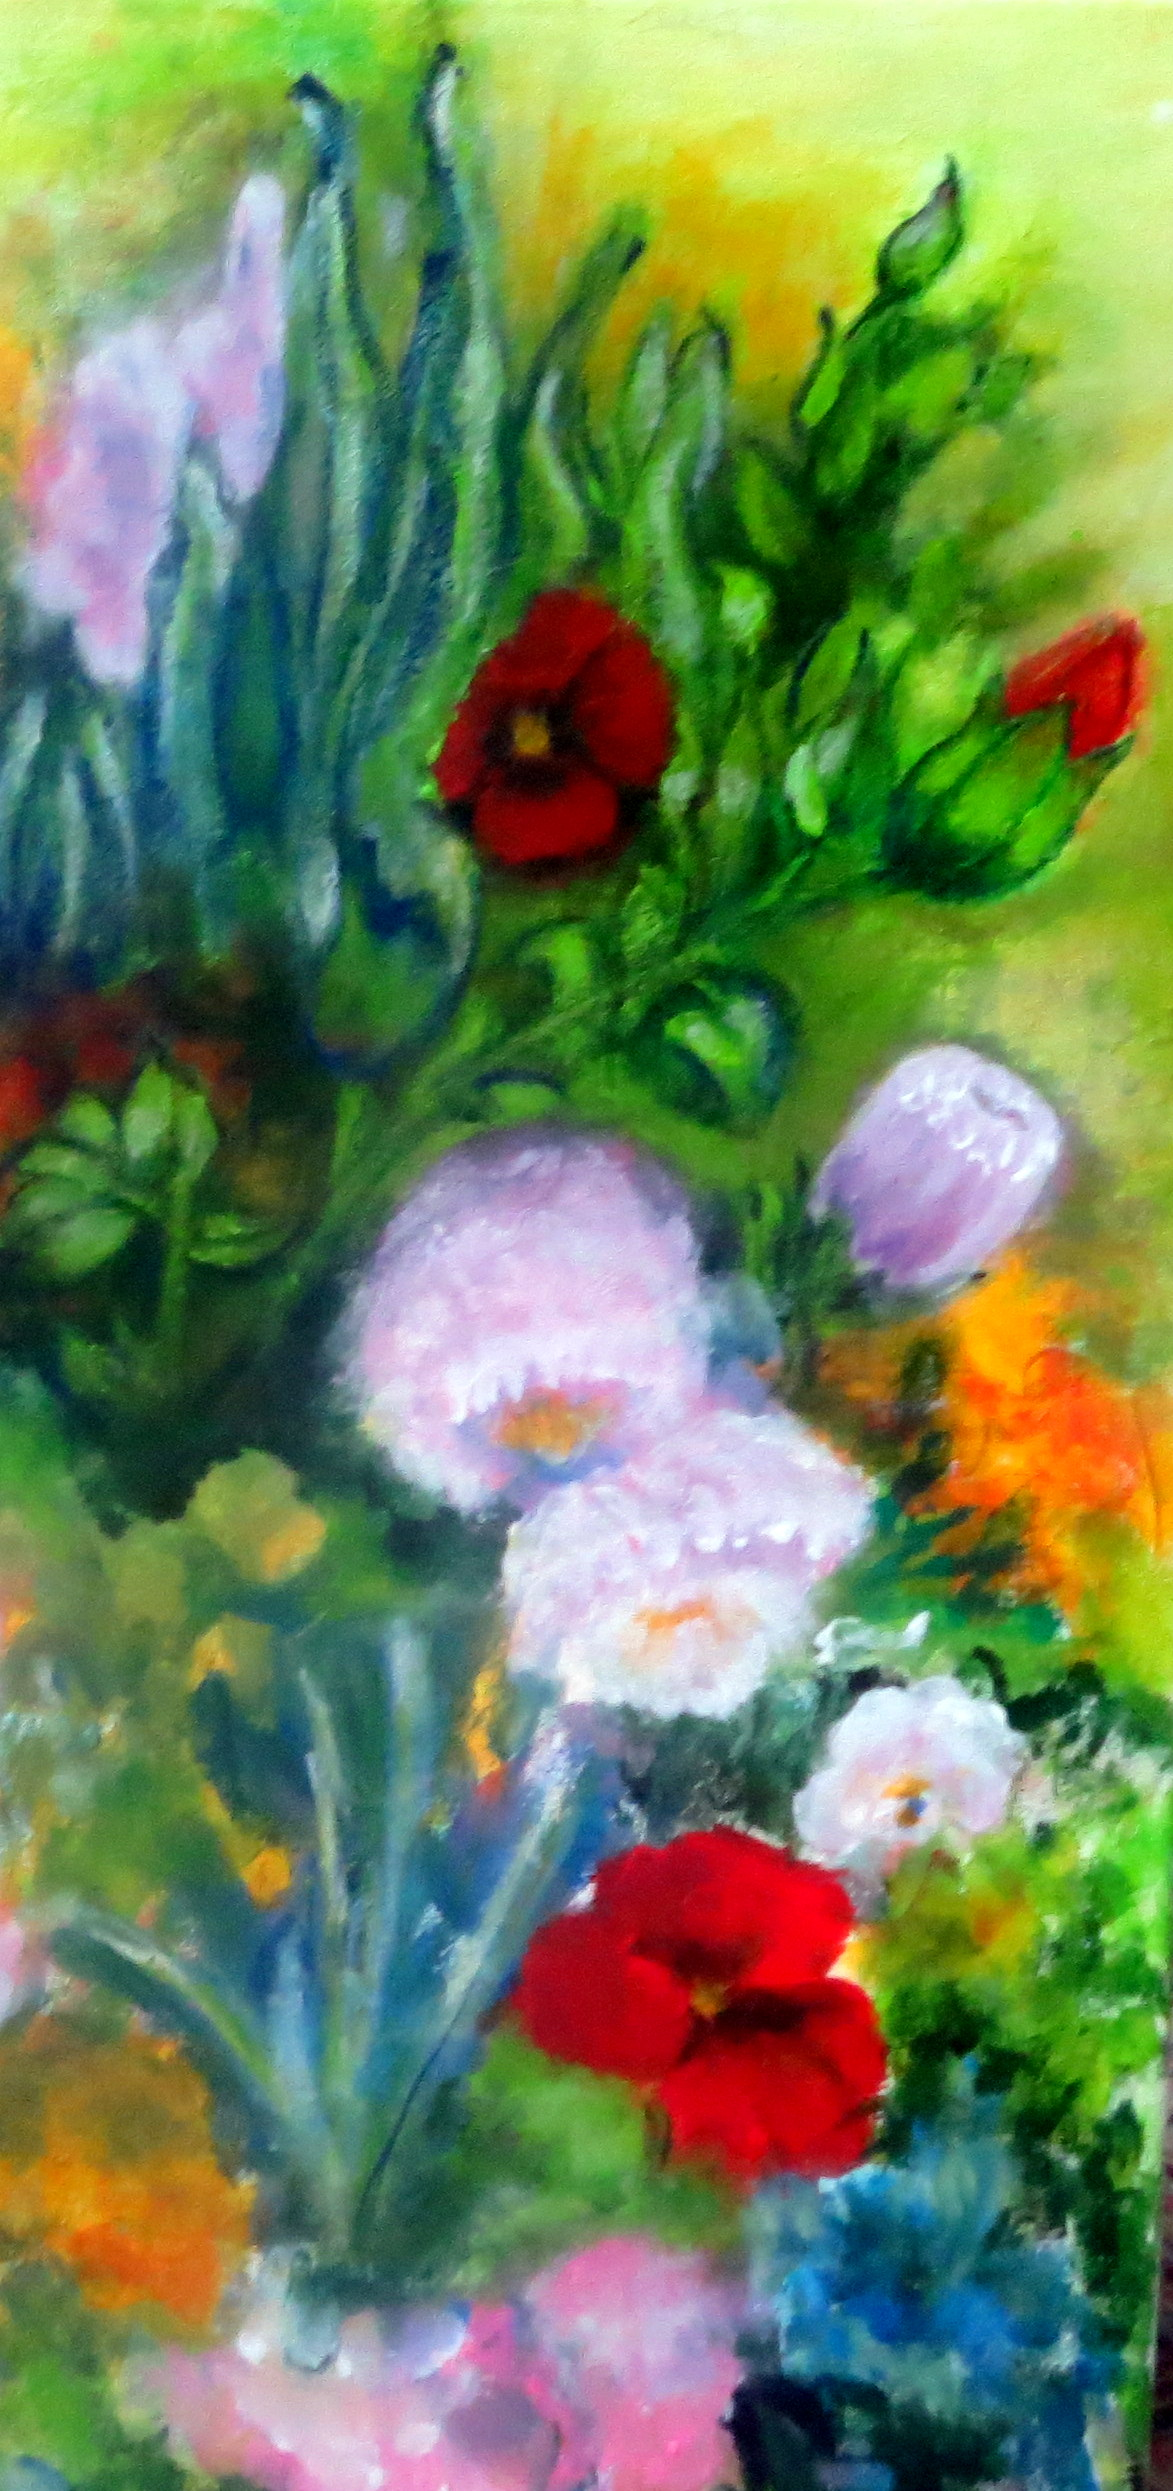 Summer garden detail 4